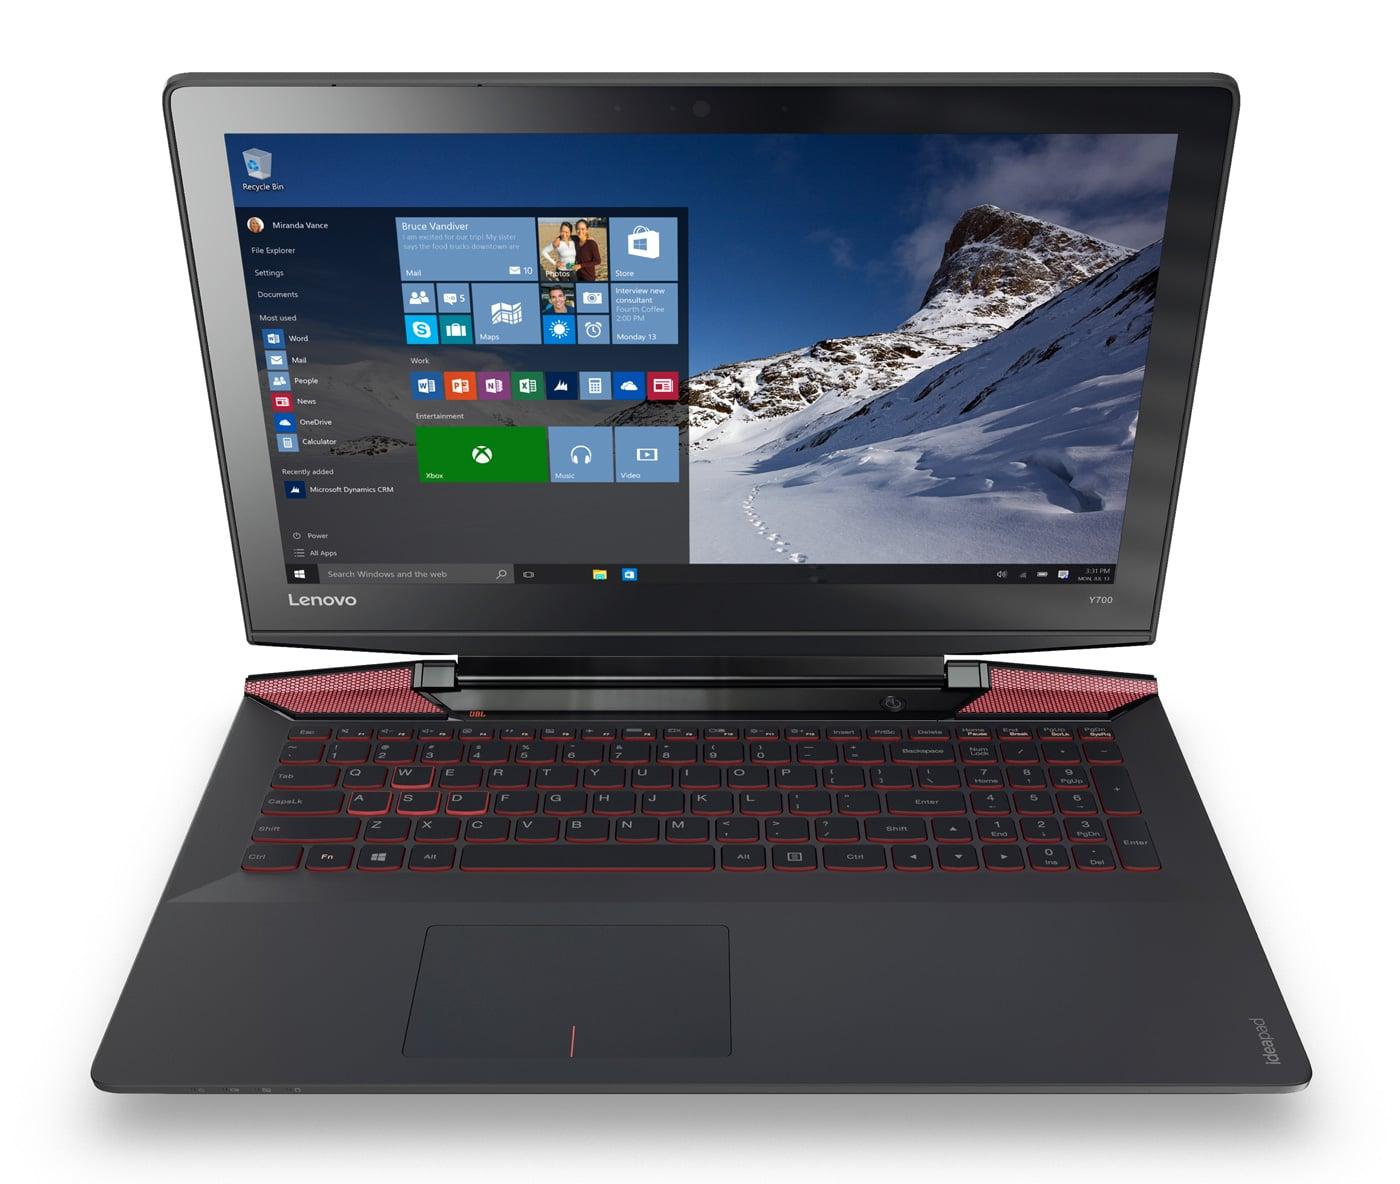 Lenovo Ideapad Y700, 17 pouces IPS 960M SSD256 Quad (699€)